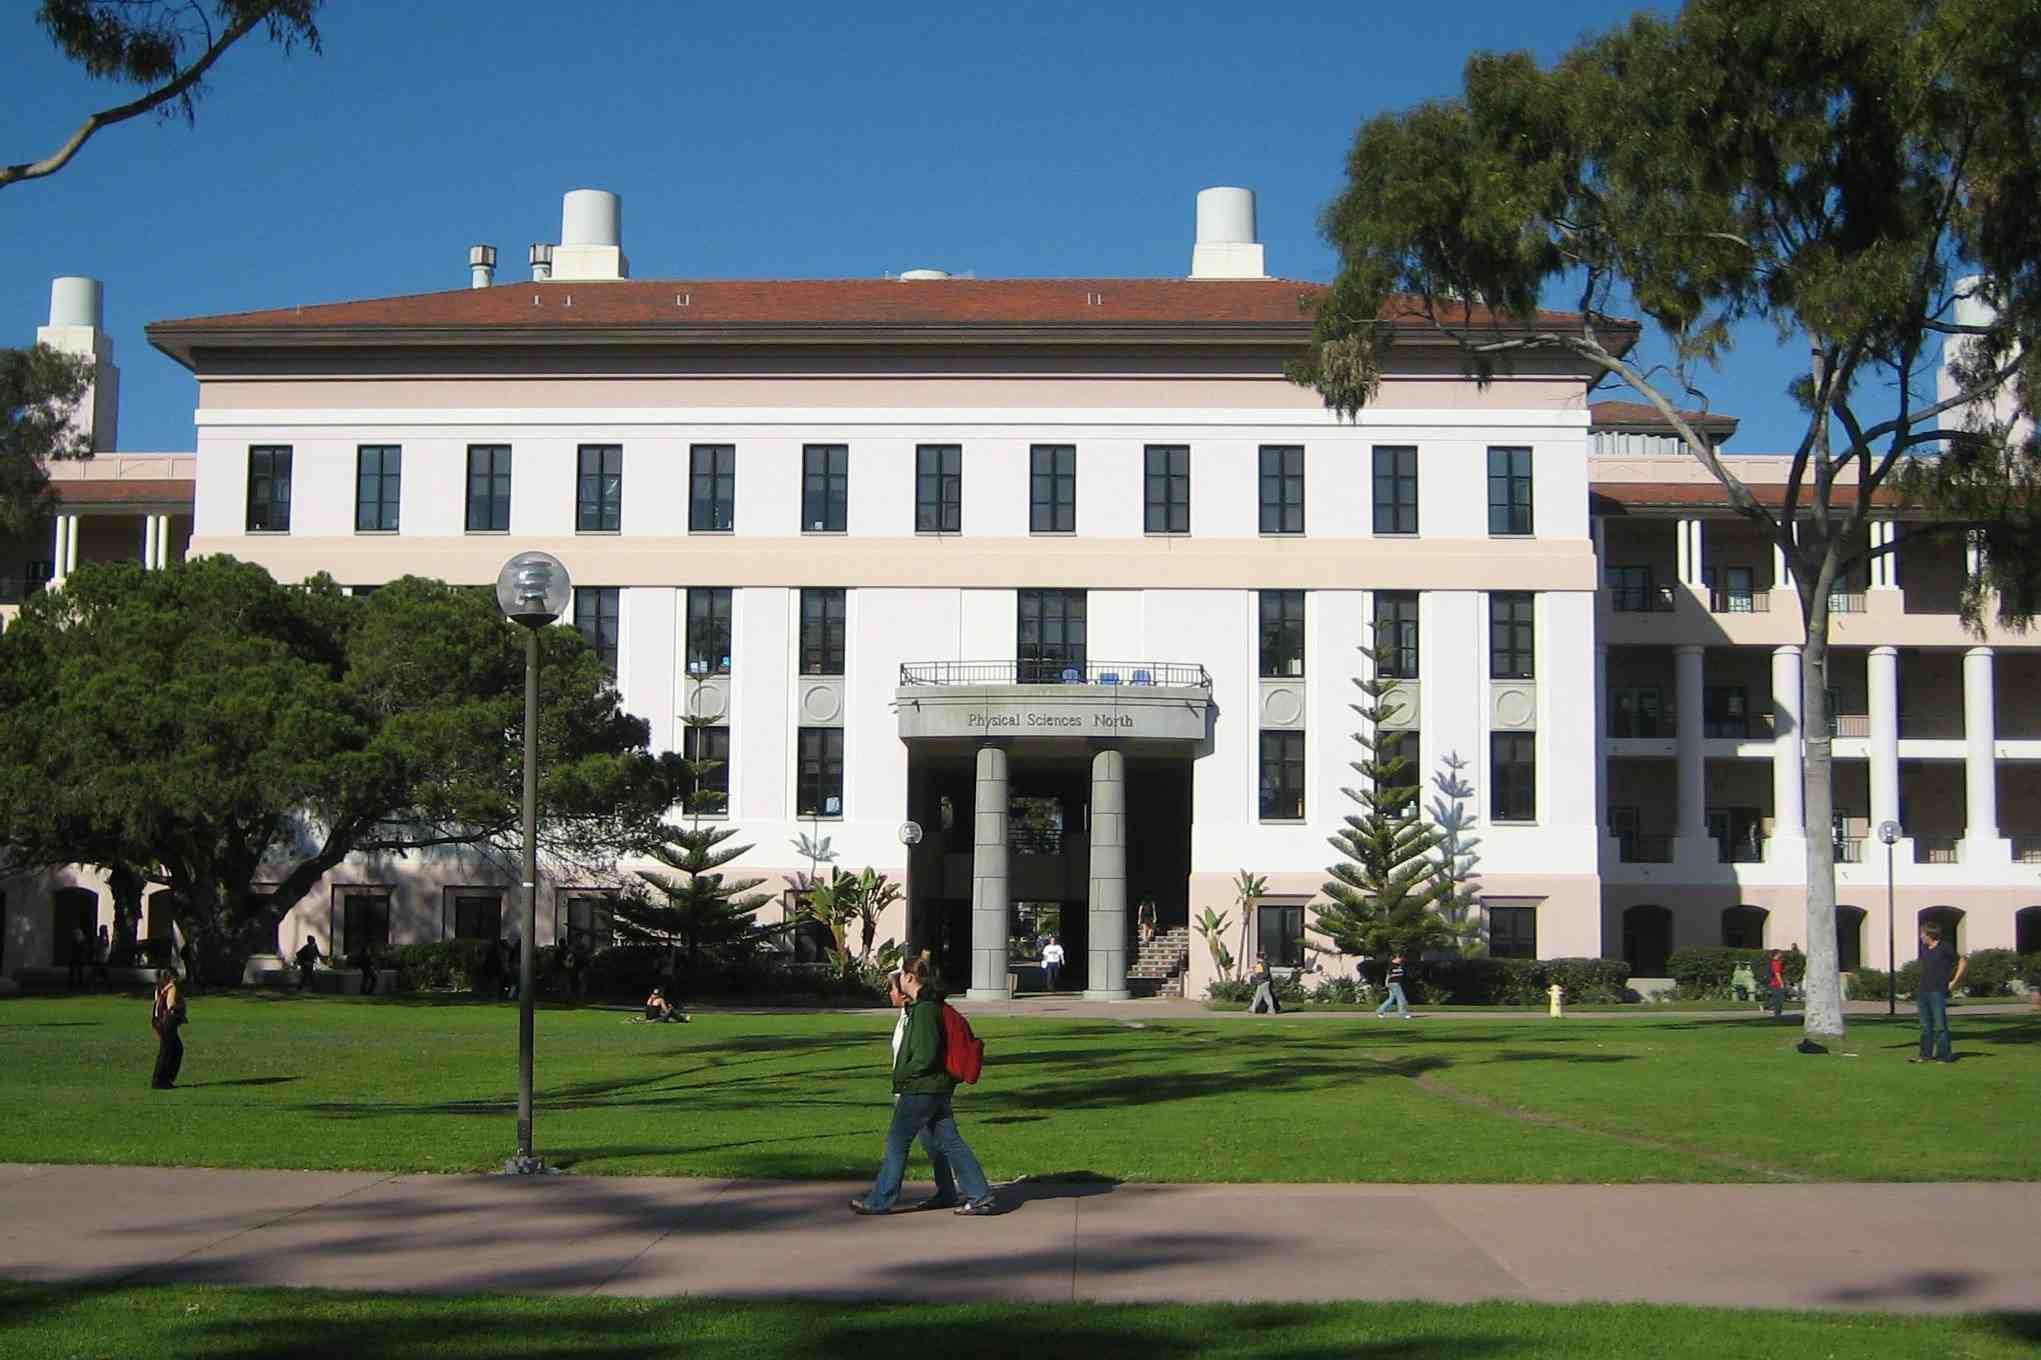 UCSB, University of California Santa Barbara